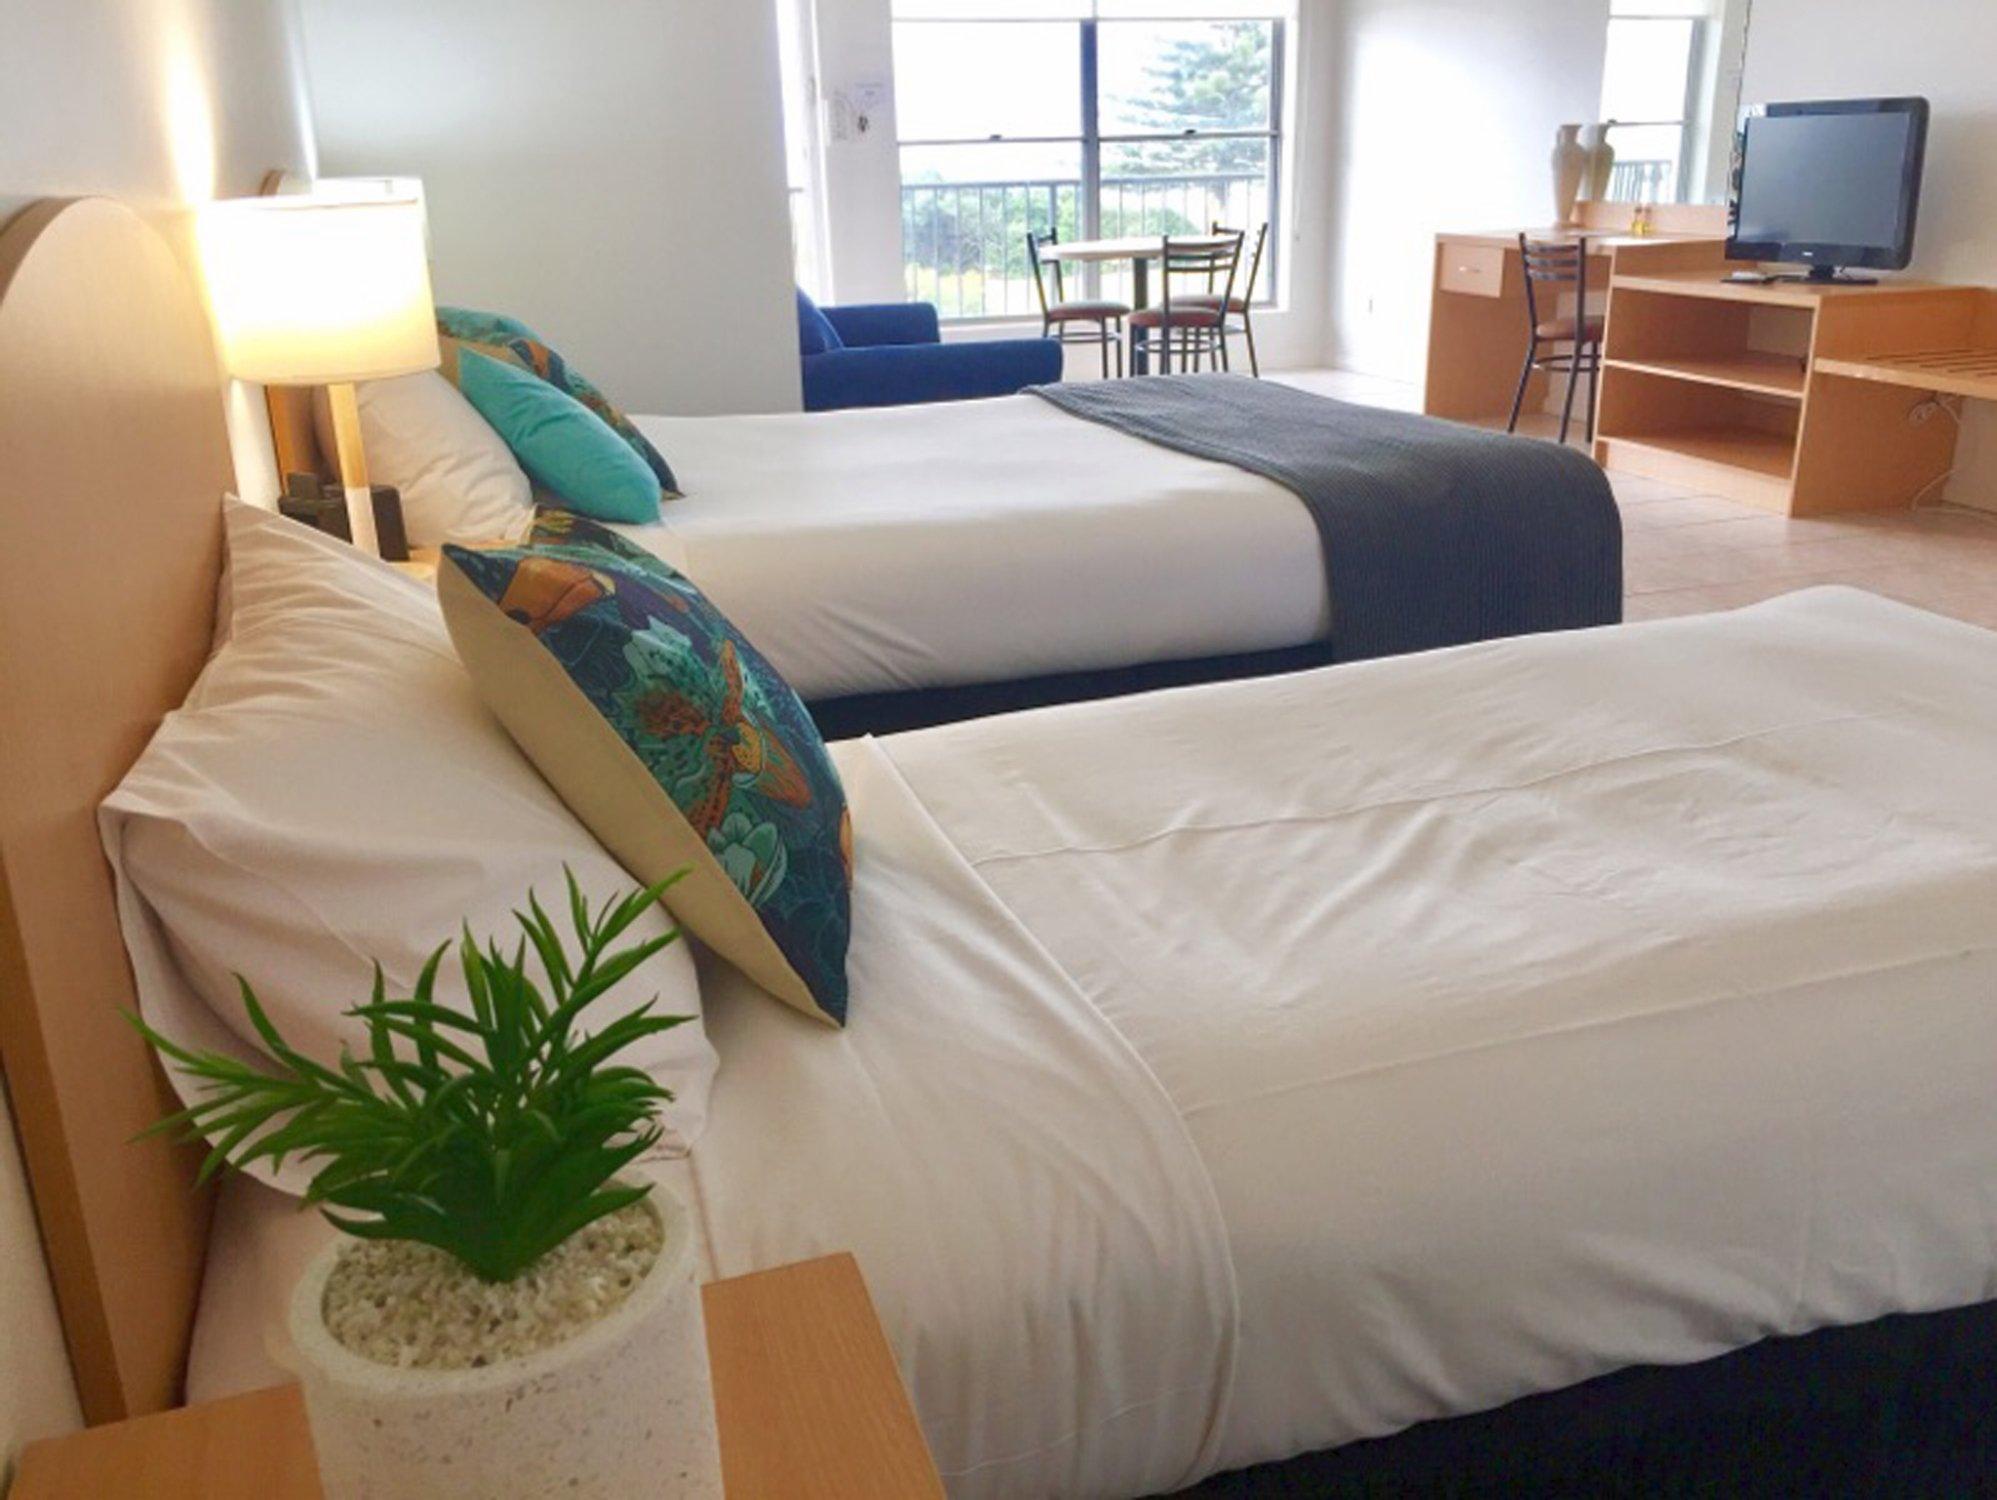 COAST Motel and Apartments